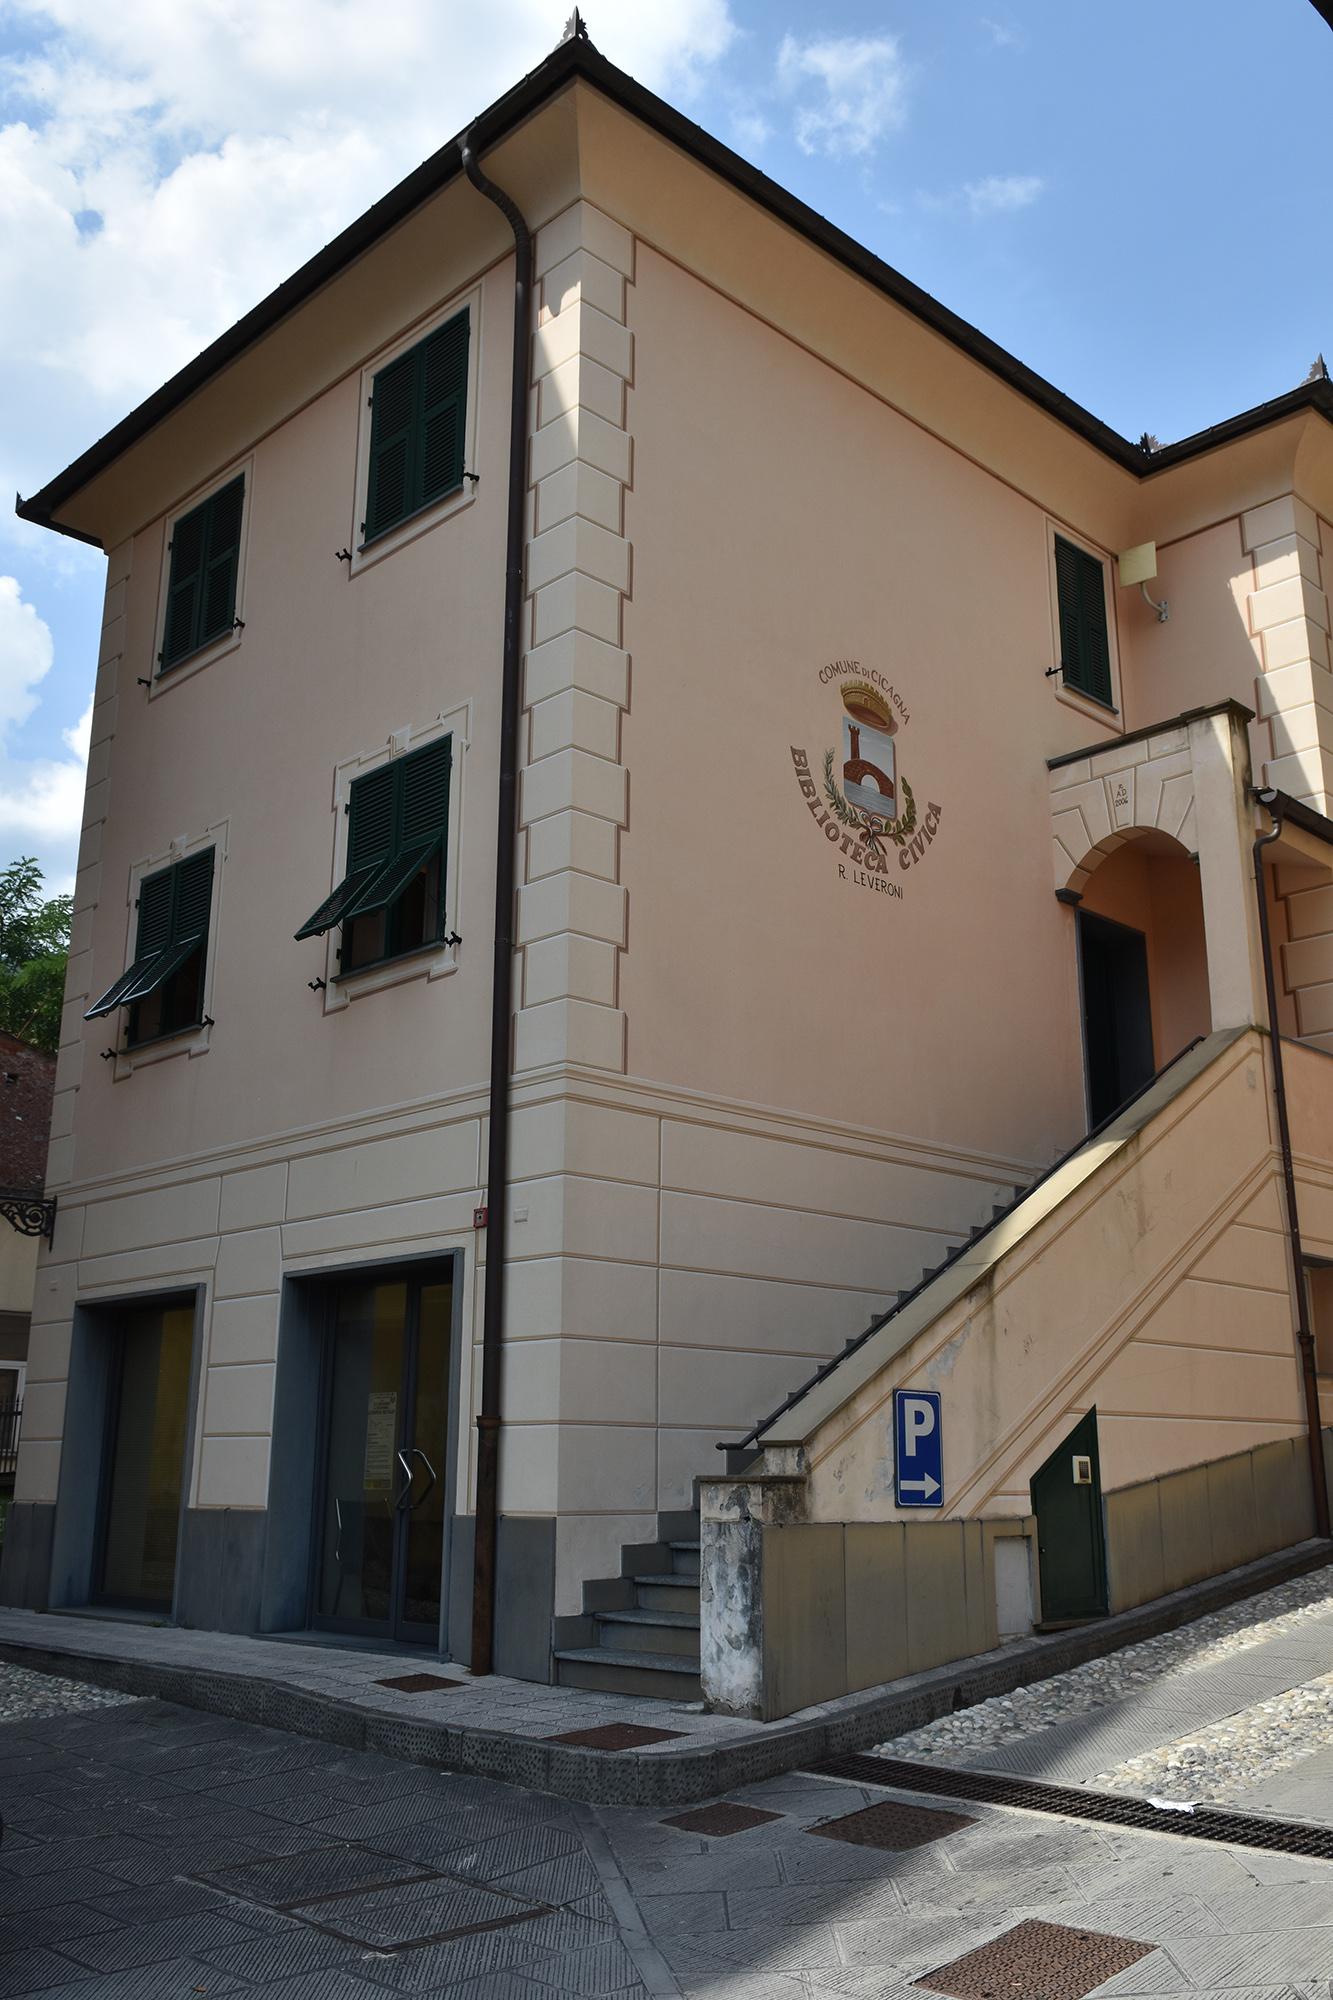 Biblioteca civica Romeo Leveroni